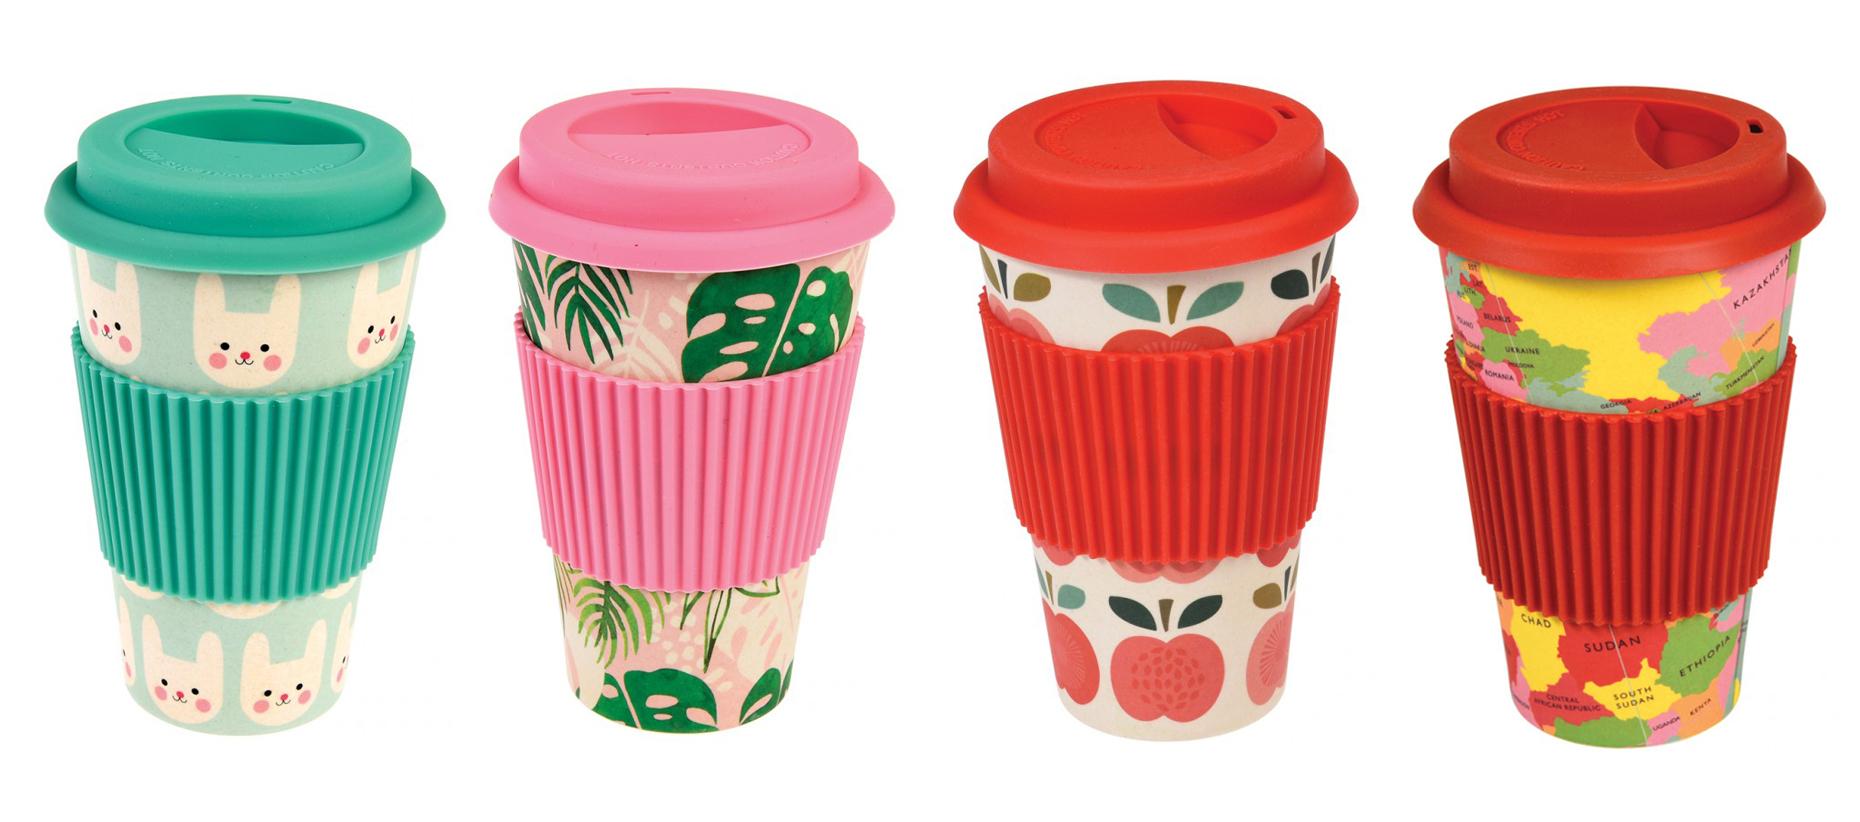 Rex London bamboo travel mug